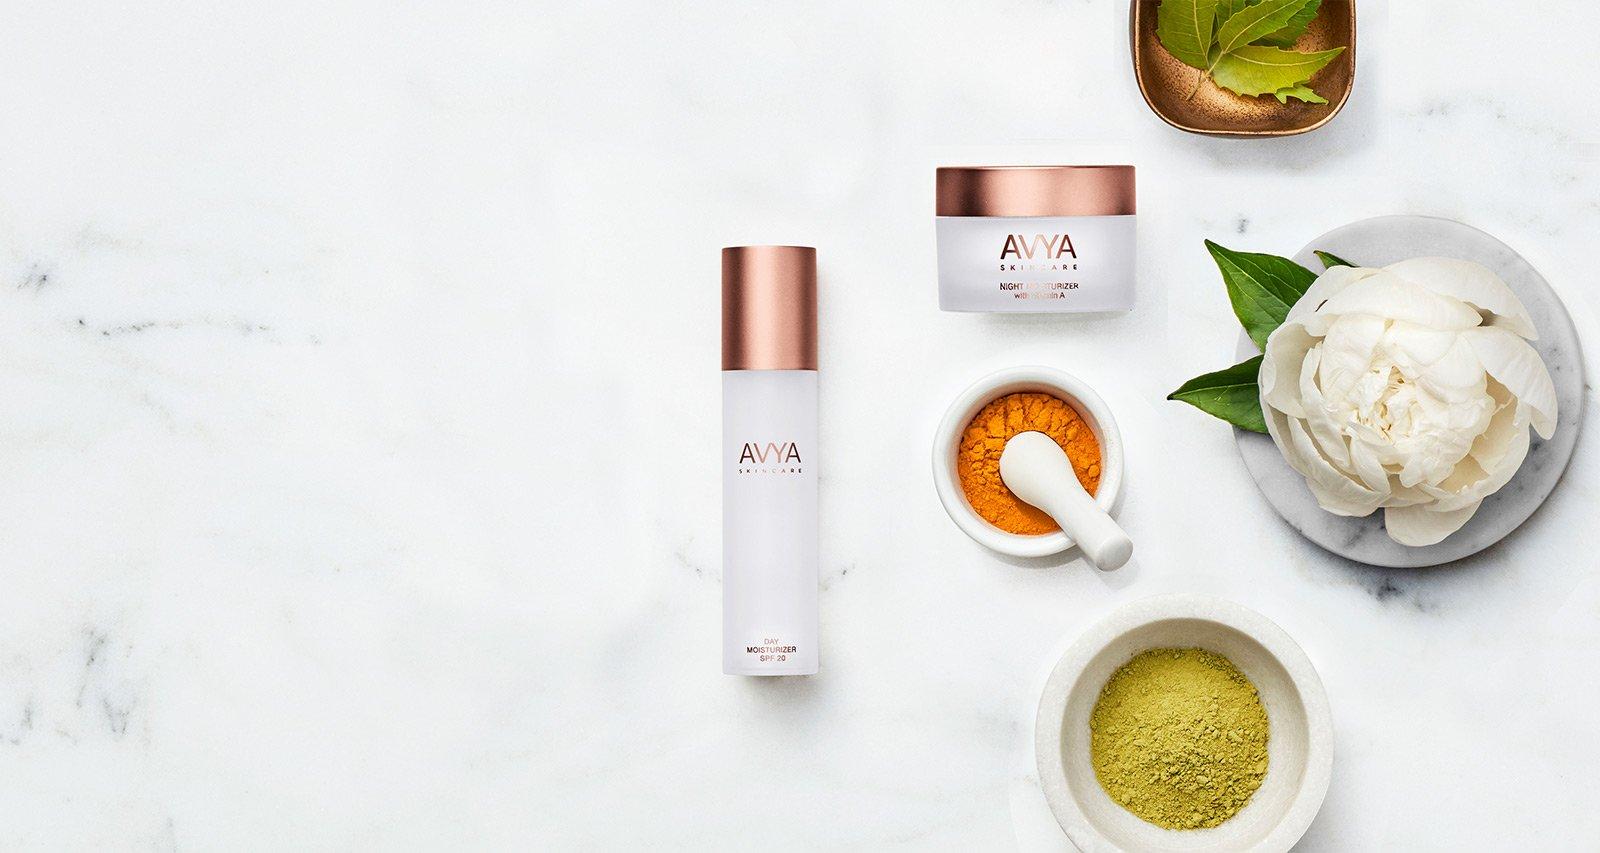 avya-products-ingredients.jpg